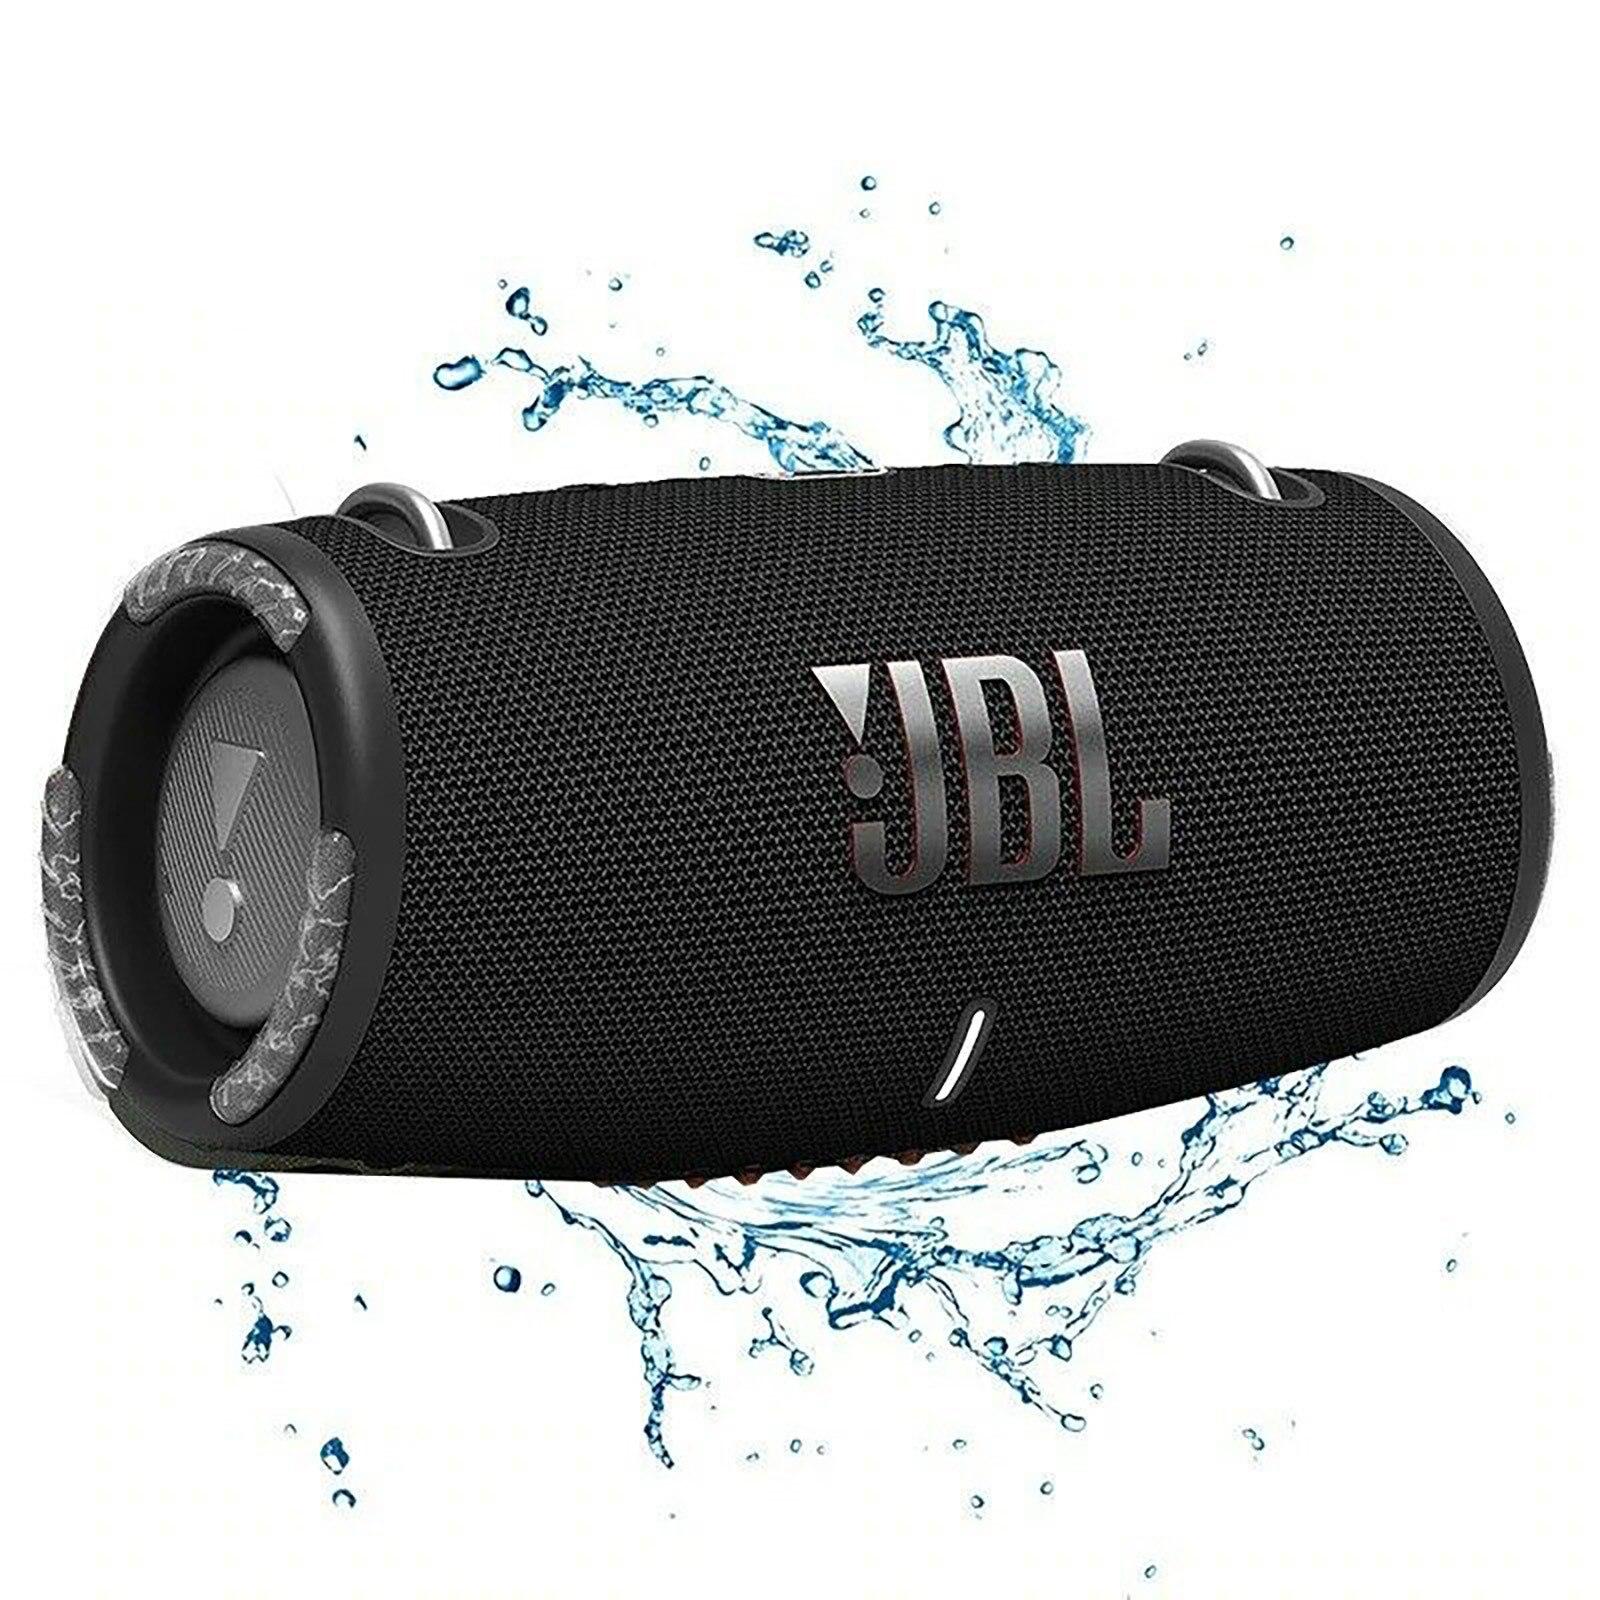 JBL Xtreme 3 سمّاعات بلوتوث قابل للنقل خارجيّ لاسلكيّ مقاوم للماء Xtreme3 قوي عميق مضخم صوت موسيقى حفلة Charge5